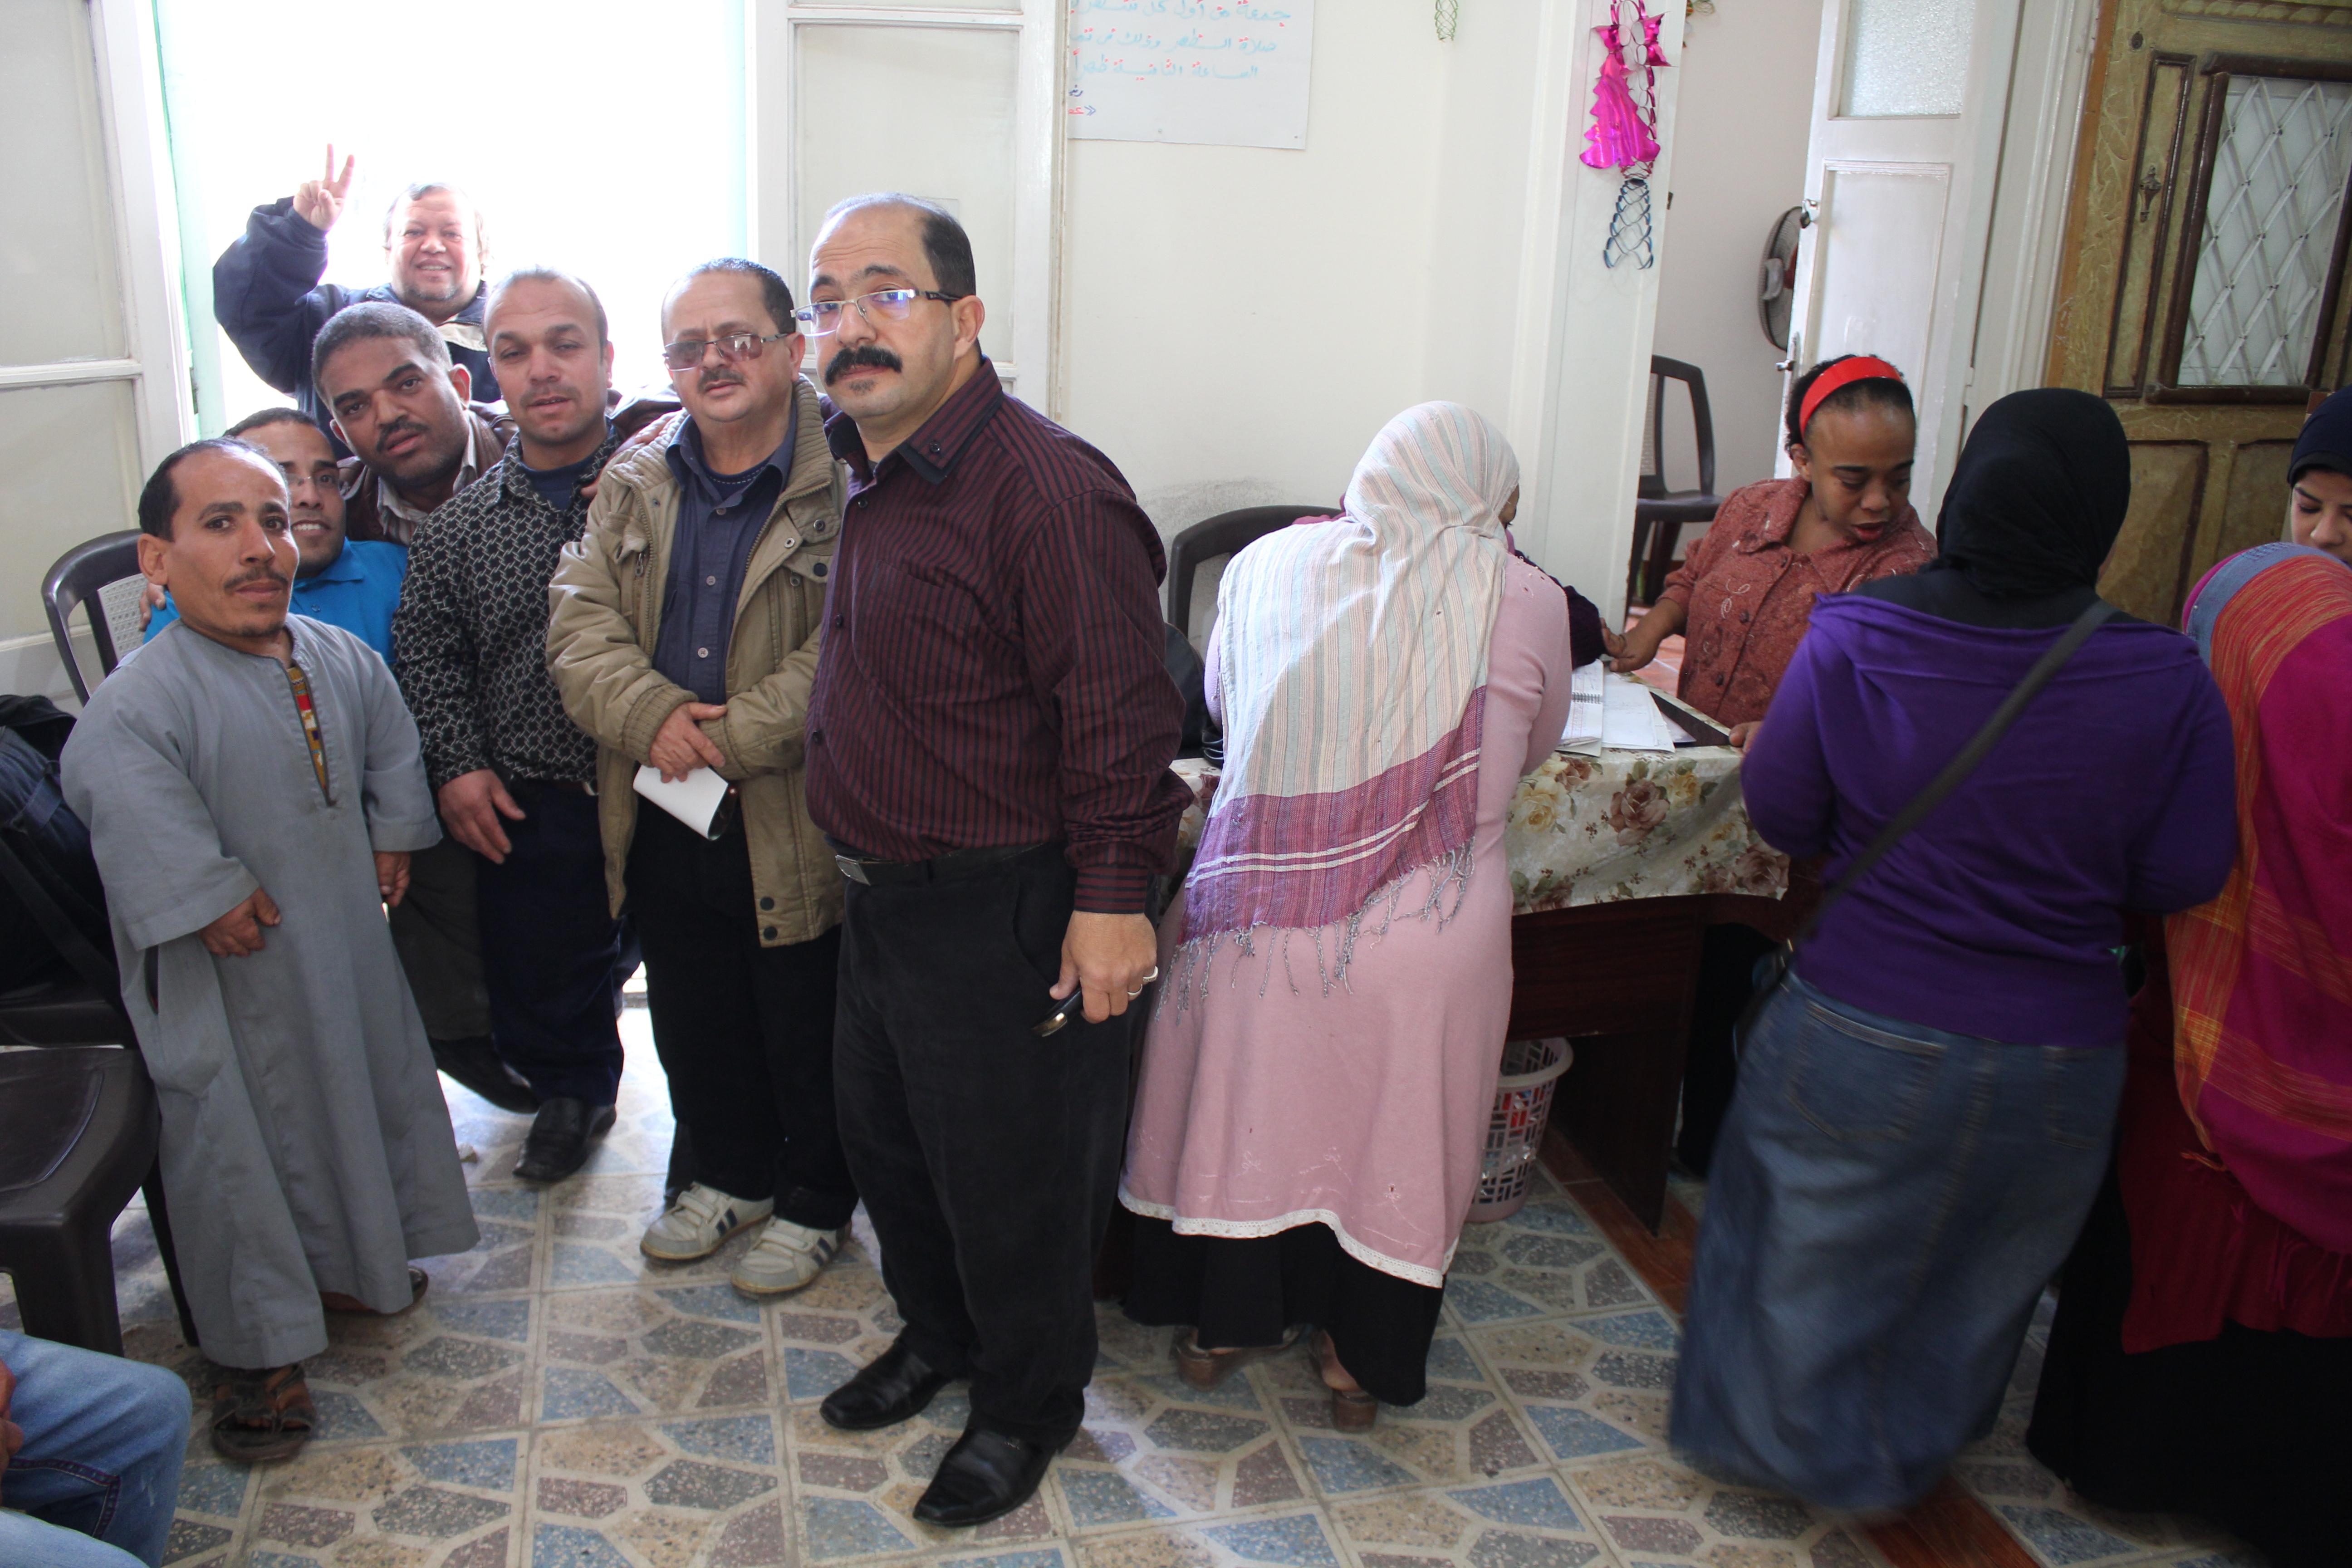 Association for the Welfare of Dwarfs in Alexandria